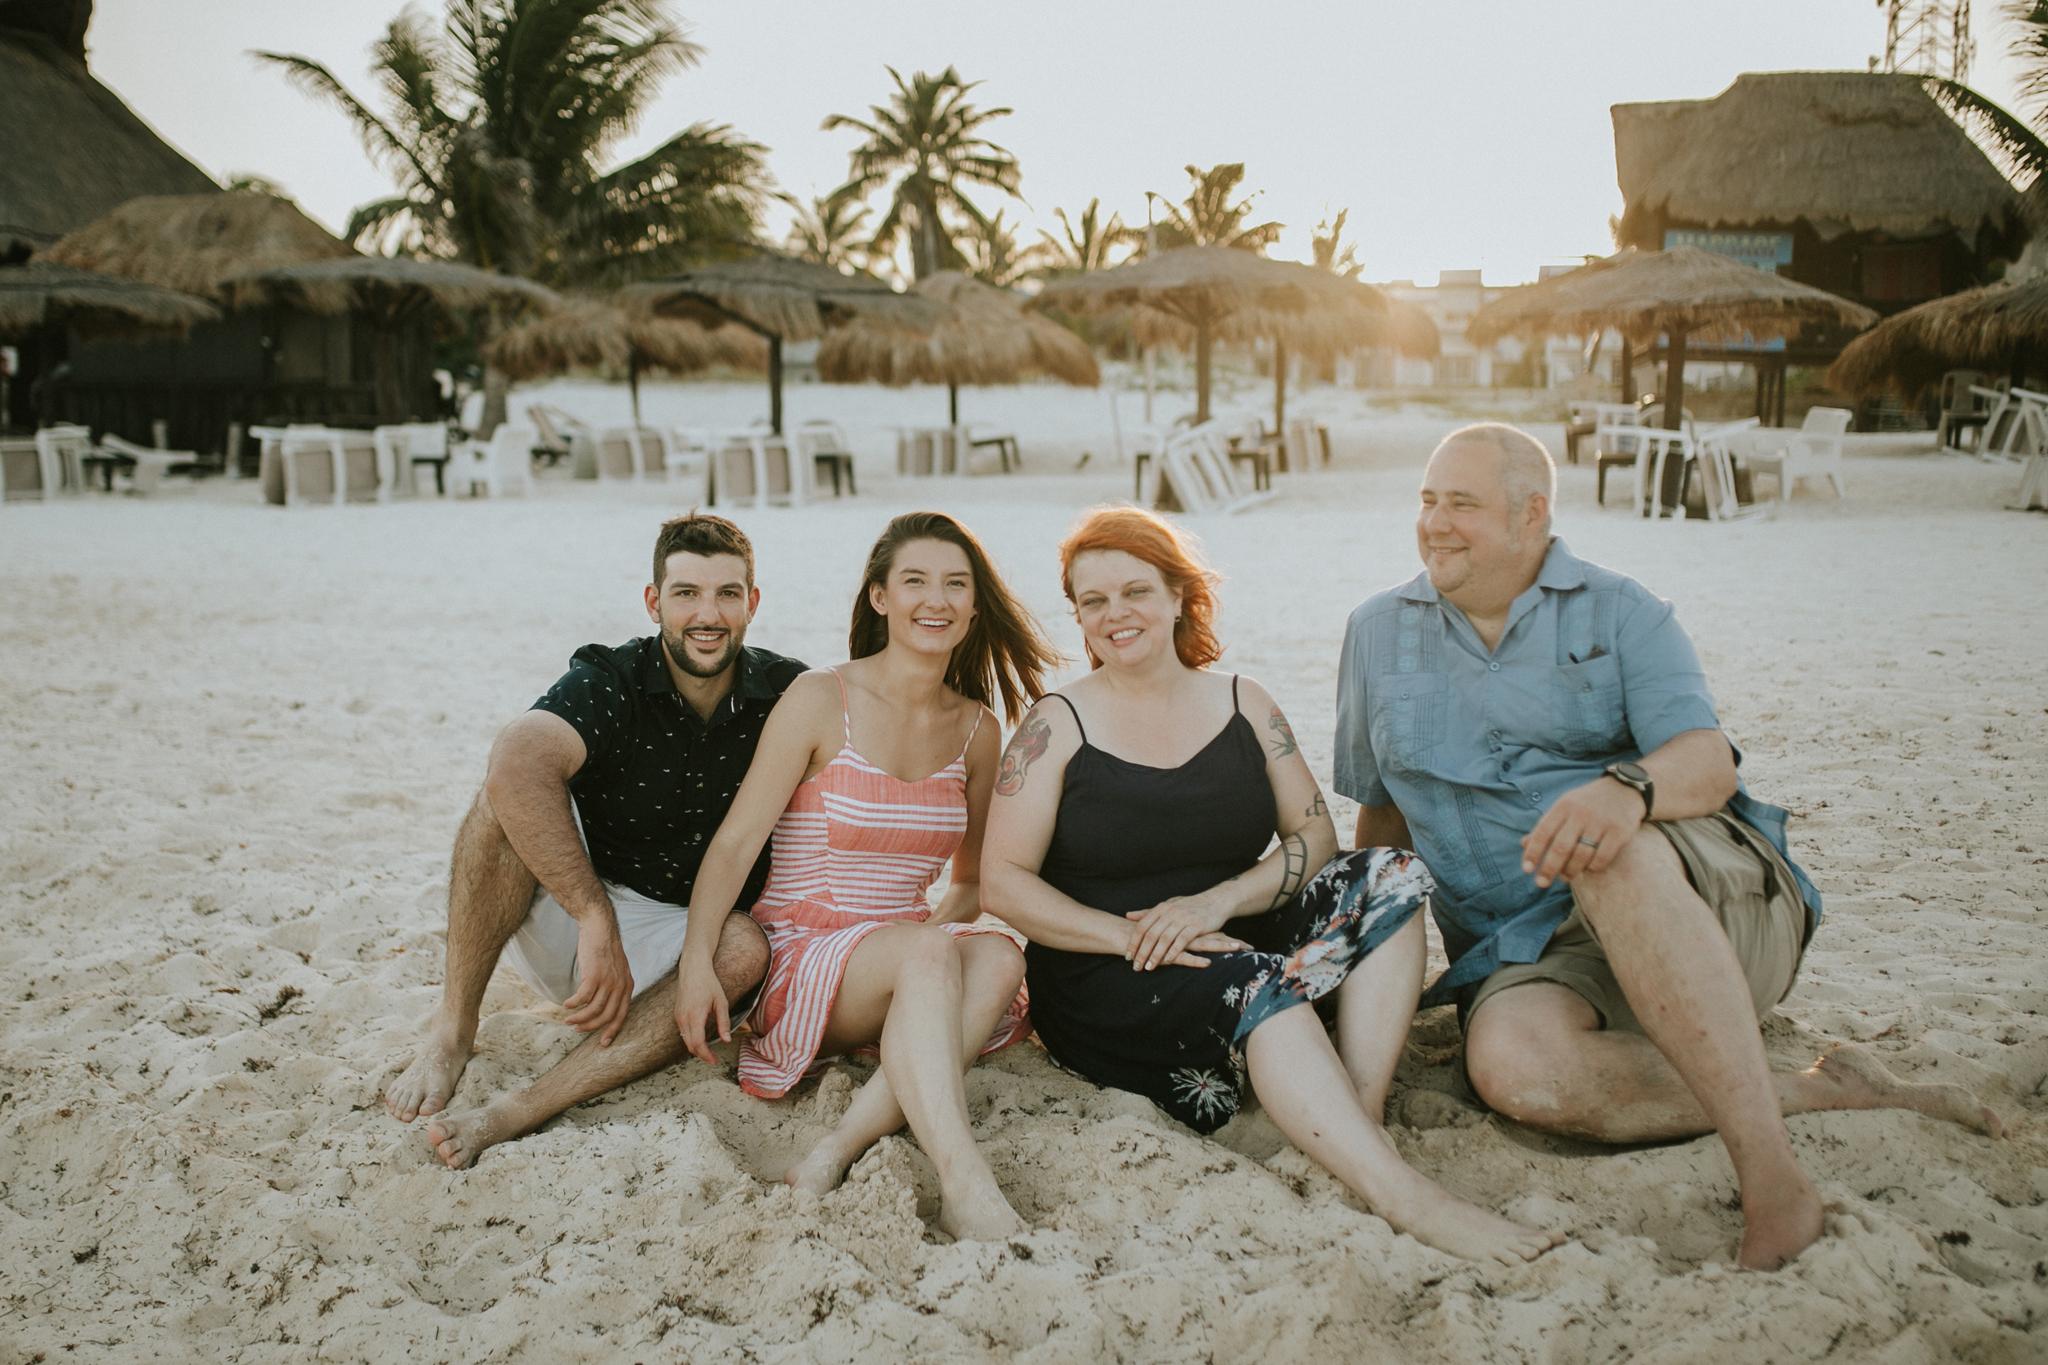 cancun-07-13-2019-family-trip-32_original.jpg